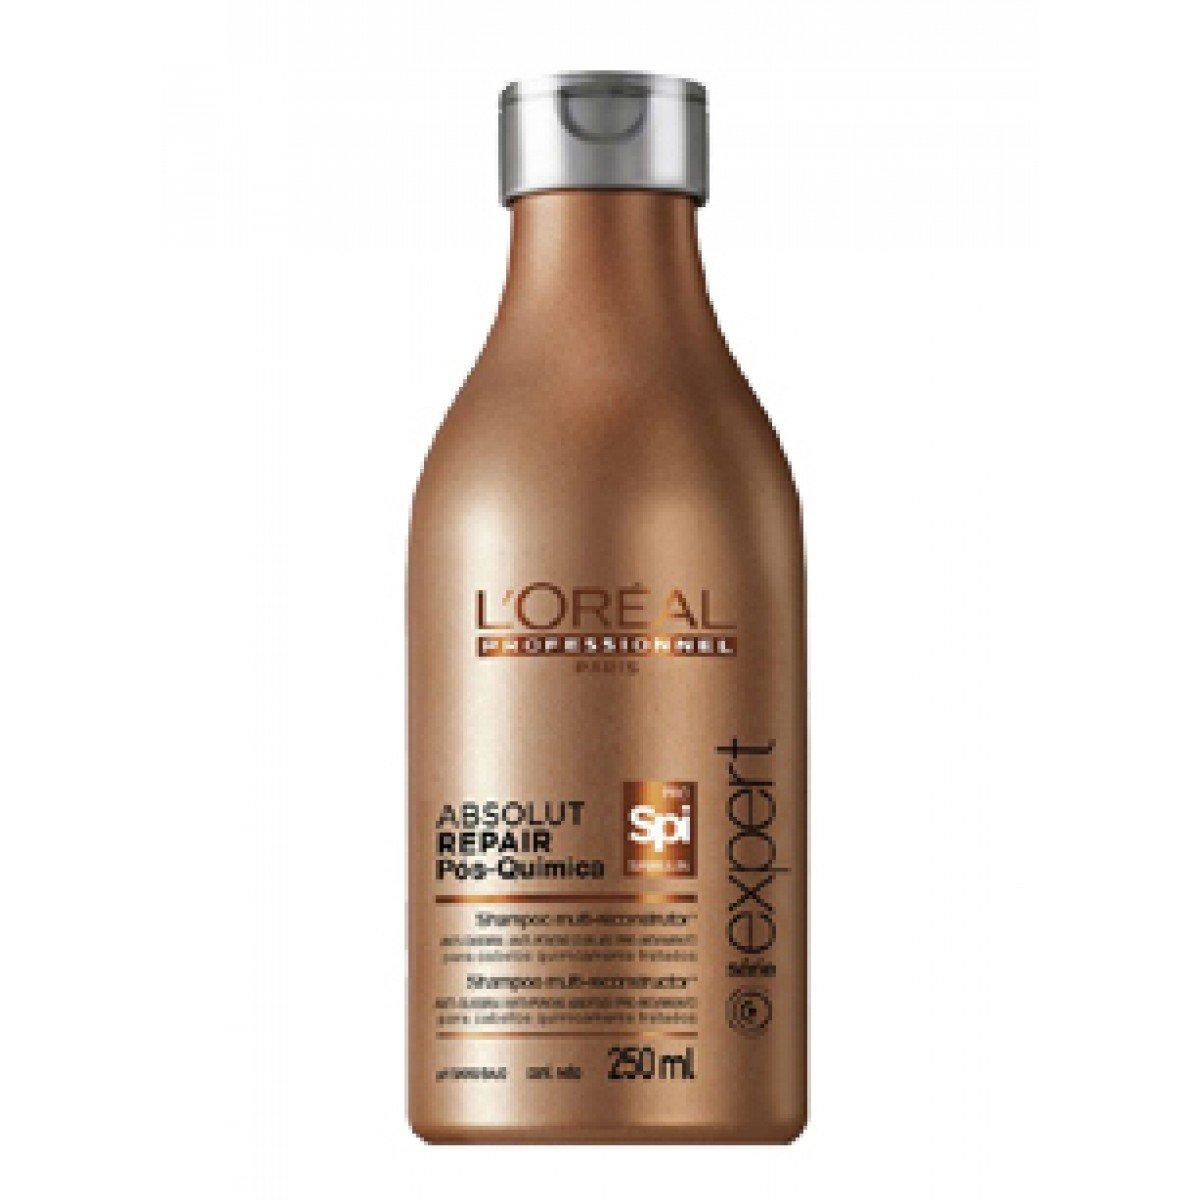 Shampoo L'Oréal Professionnel Absolut Repair Pós Química - 250ml